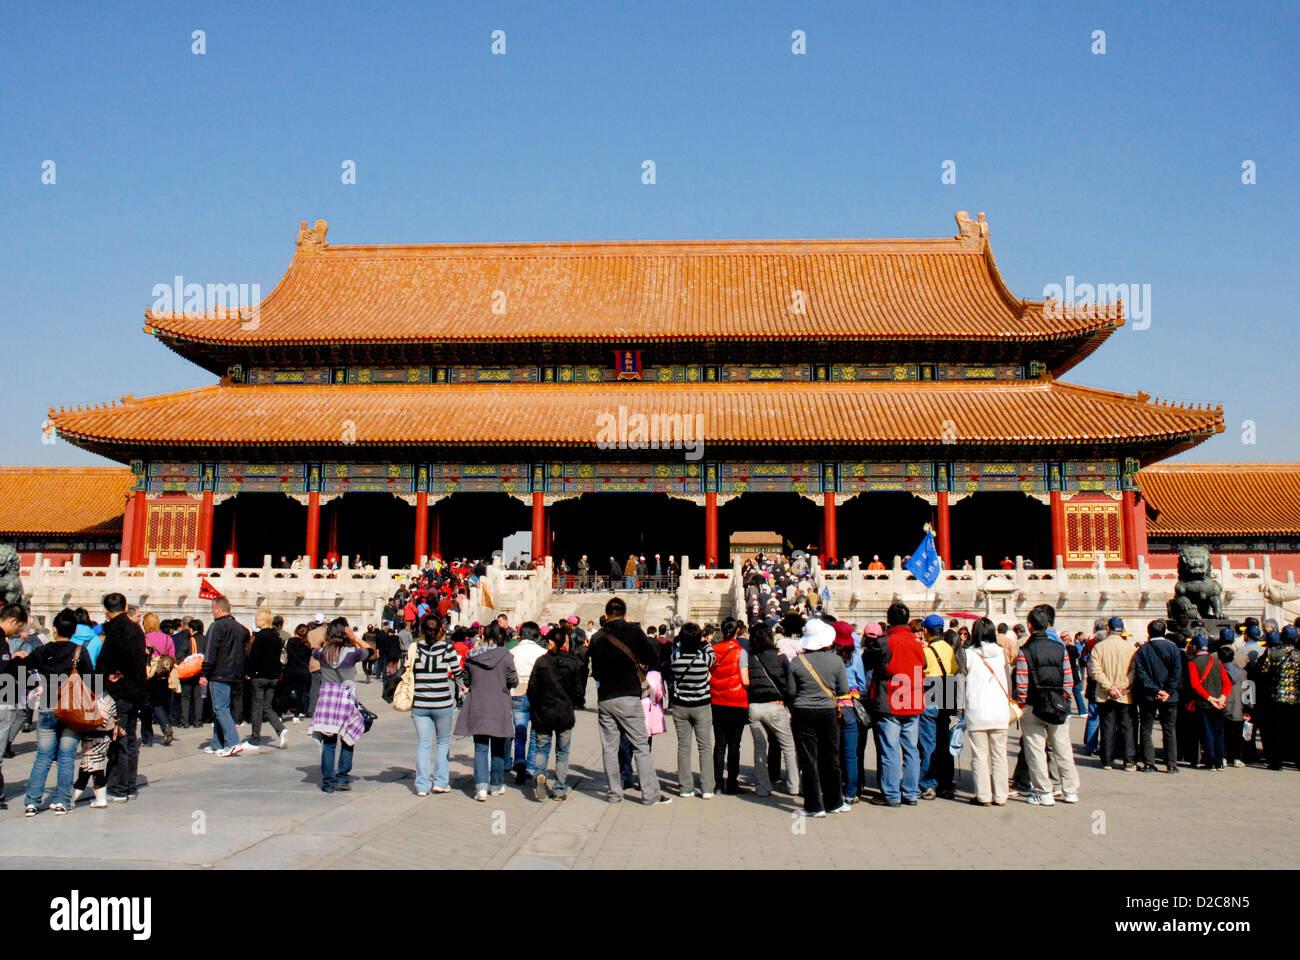 Gate Of Supreme Harmony, Forbidden City, Beijing, China - Stock Image